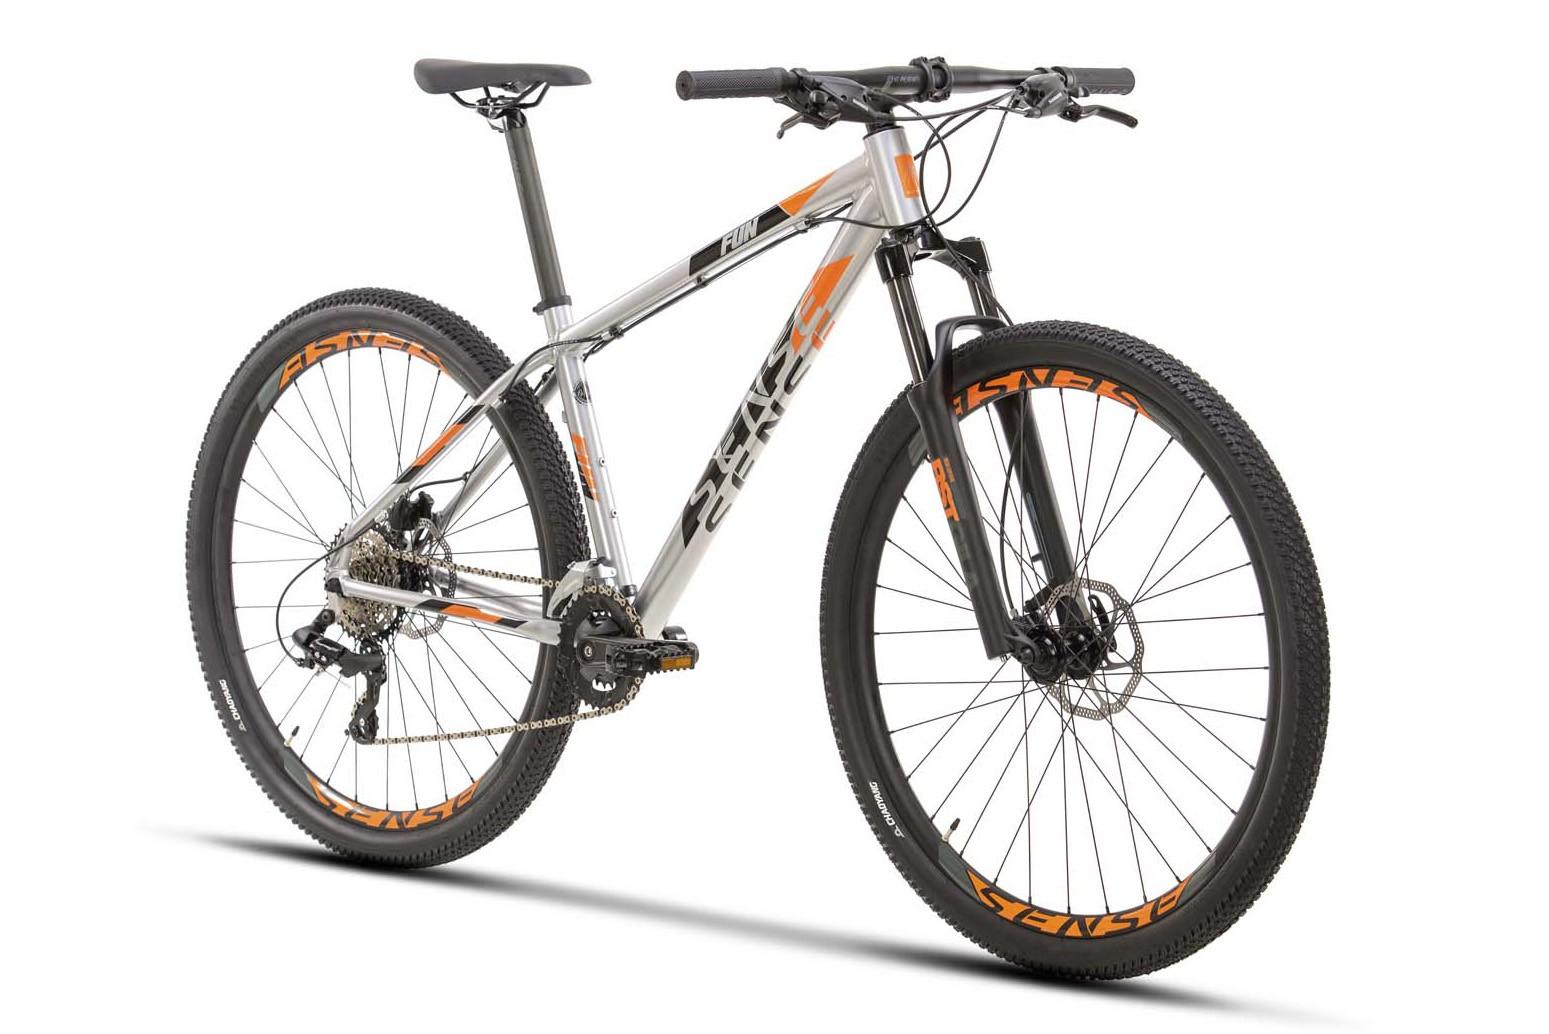 BICICLETA 29 SENSE FUN COMP 2X8 VEL ALUM/LARANJA (2021)